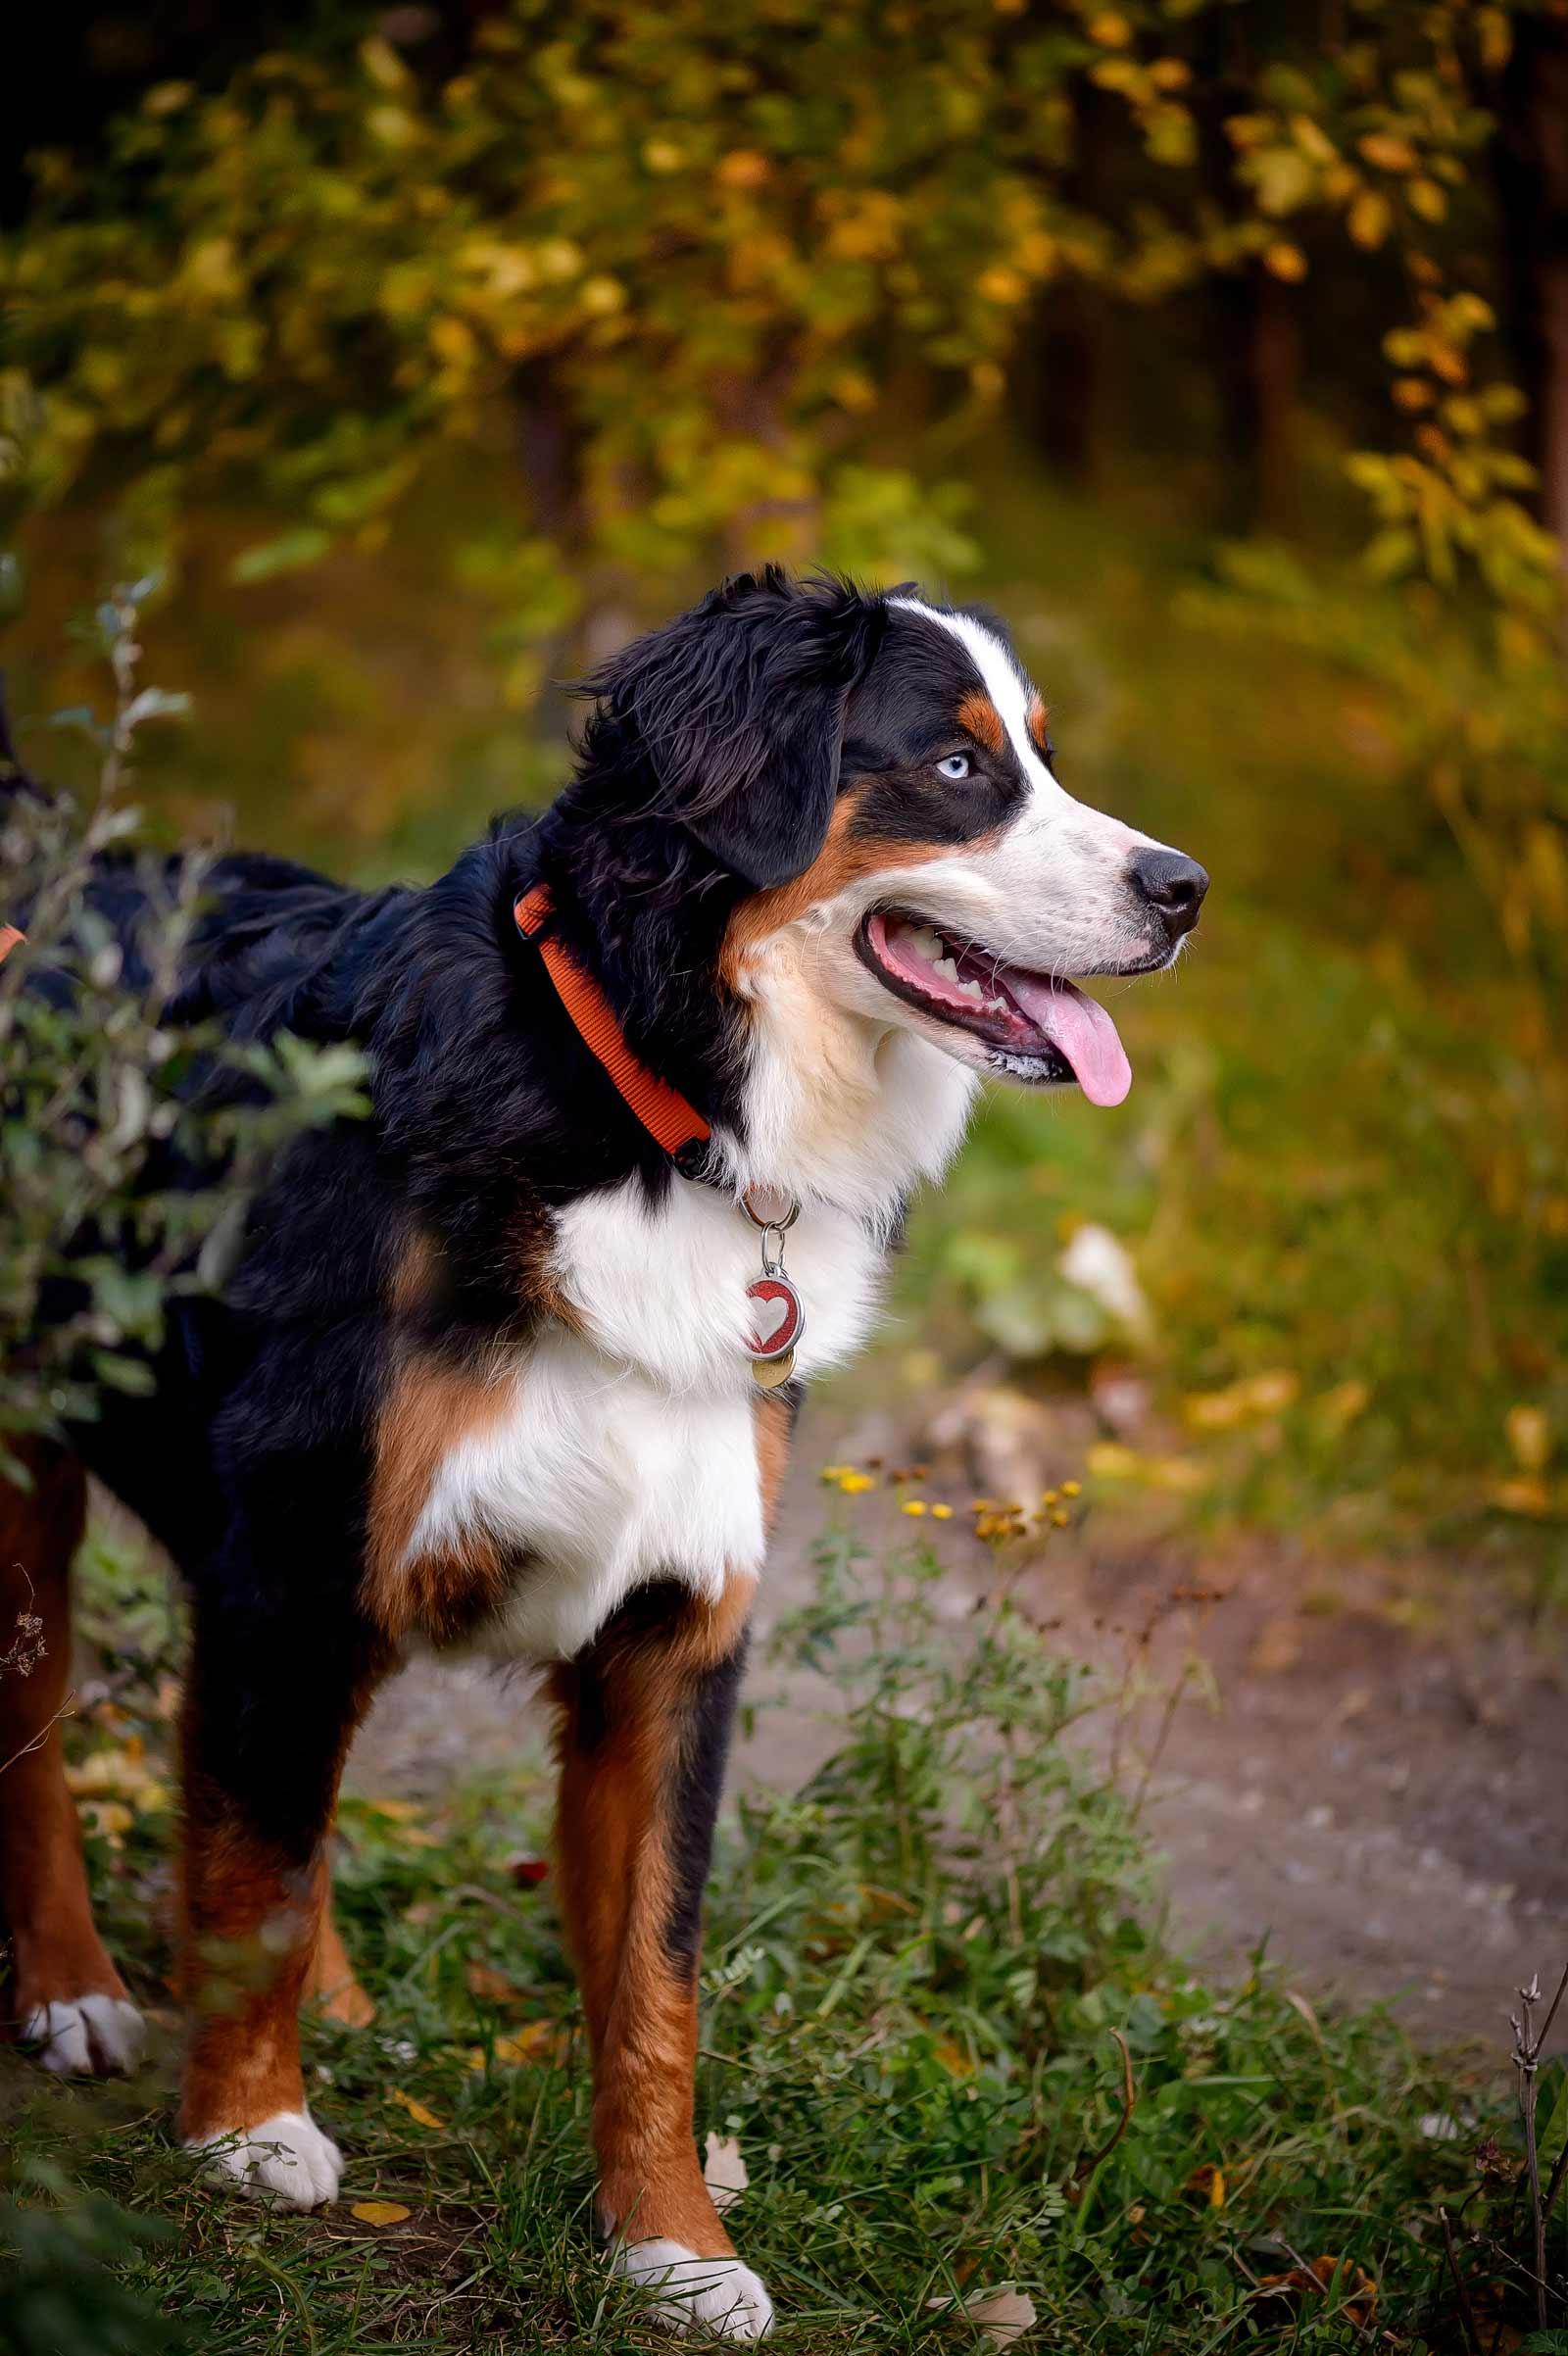 Ottawa Dog Photographer Princess Leia the Bernese mountain dog at Lemieux Island in the fall